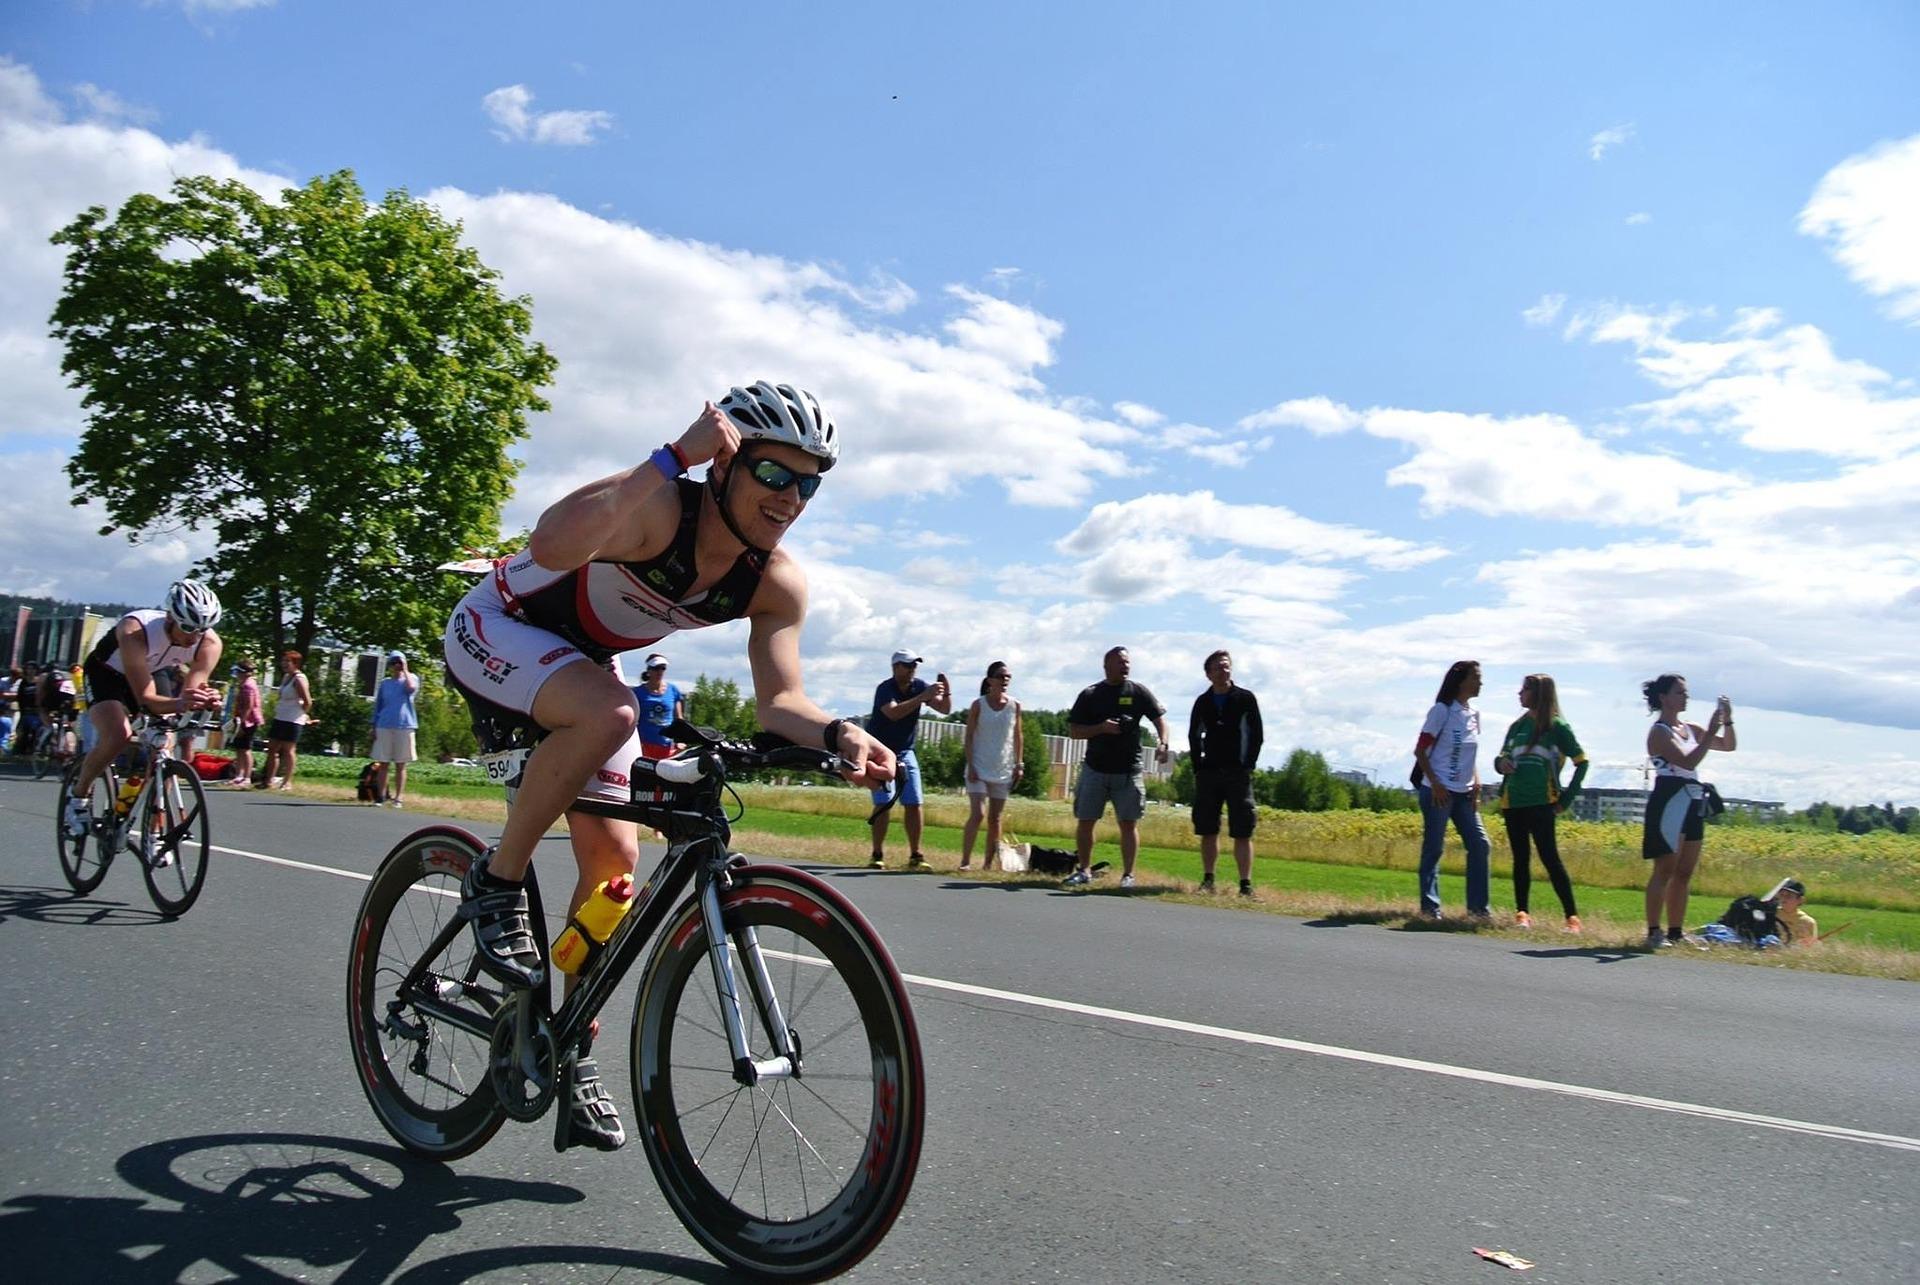 triathlon-1243899_1920